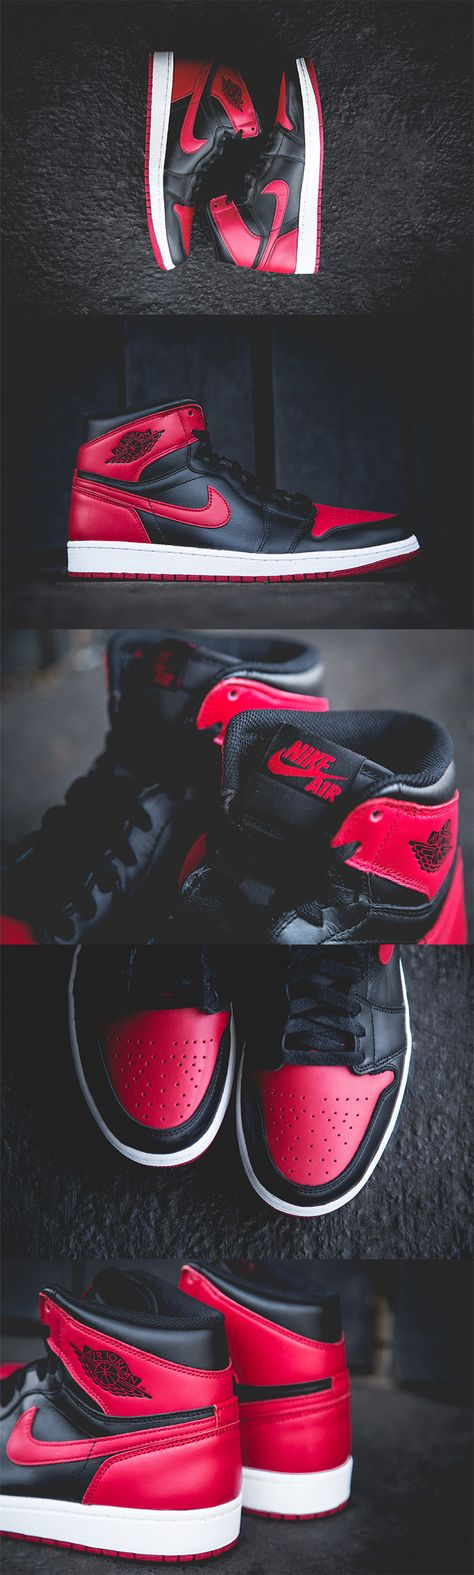 67 best Thứ cần mua images on Pinterest | Nike air jordans, Air jordan  retro and Air jordan shoes